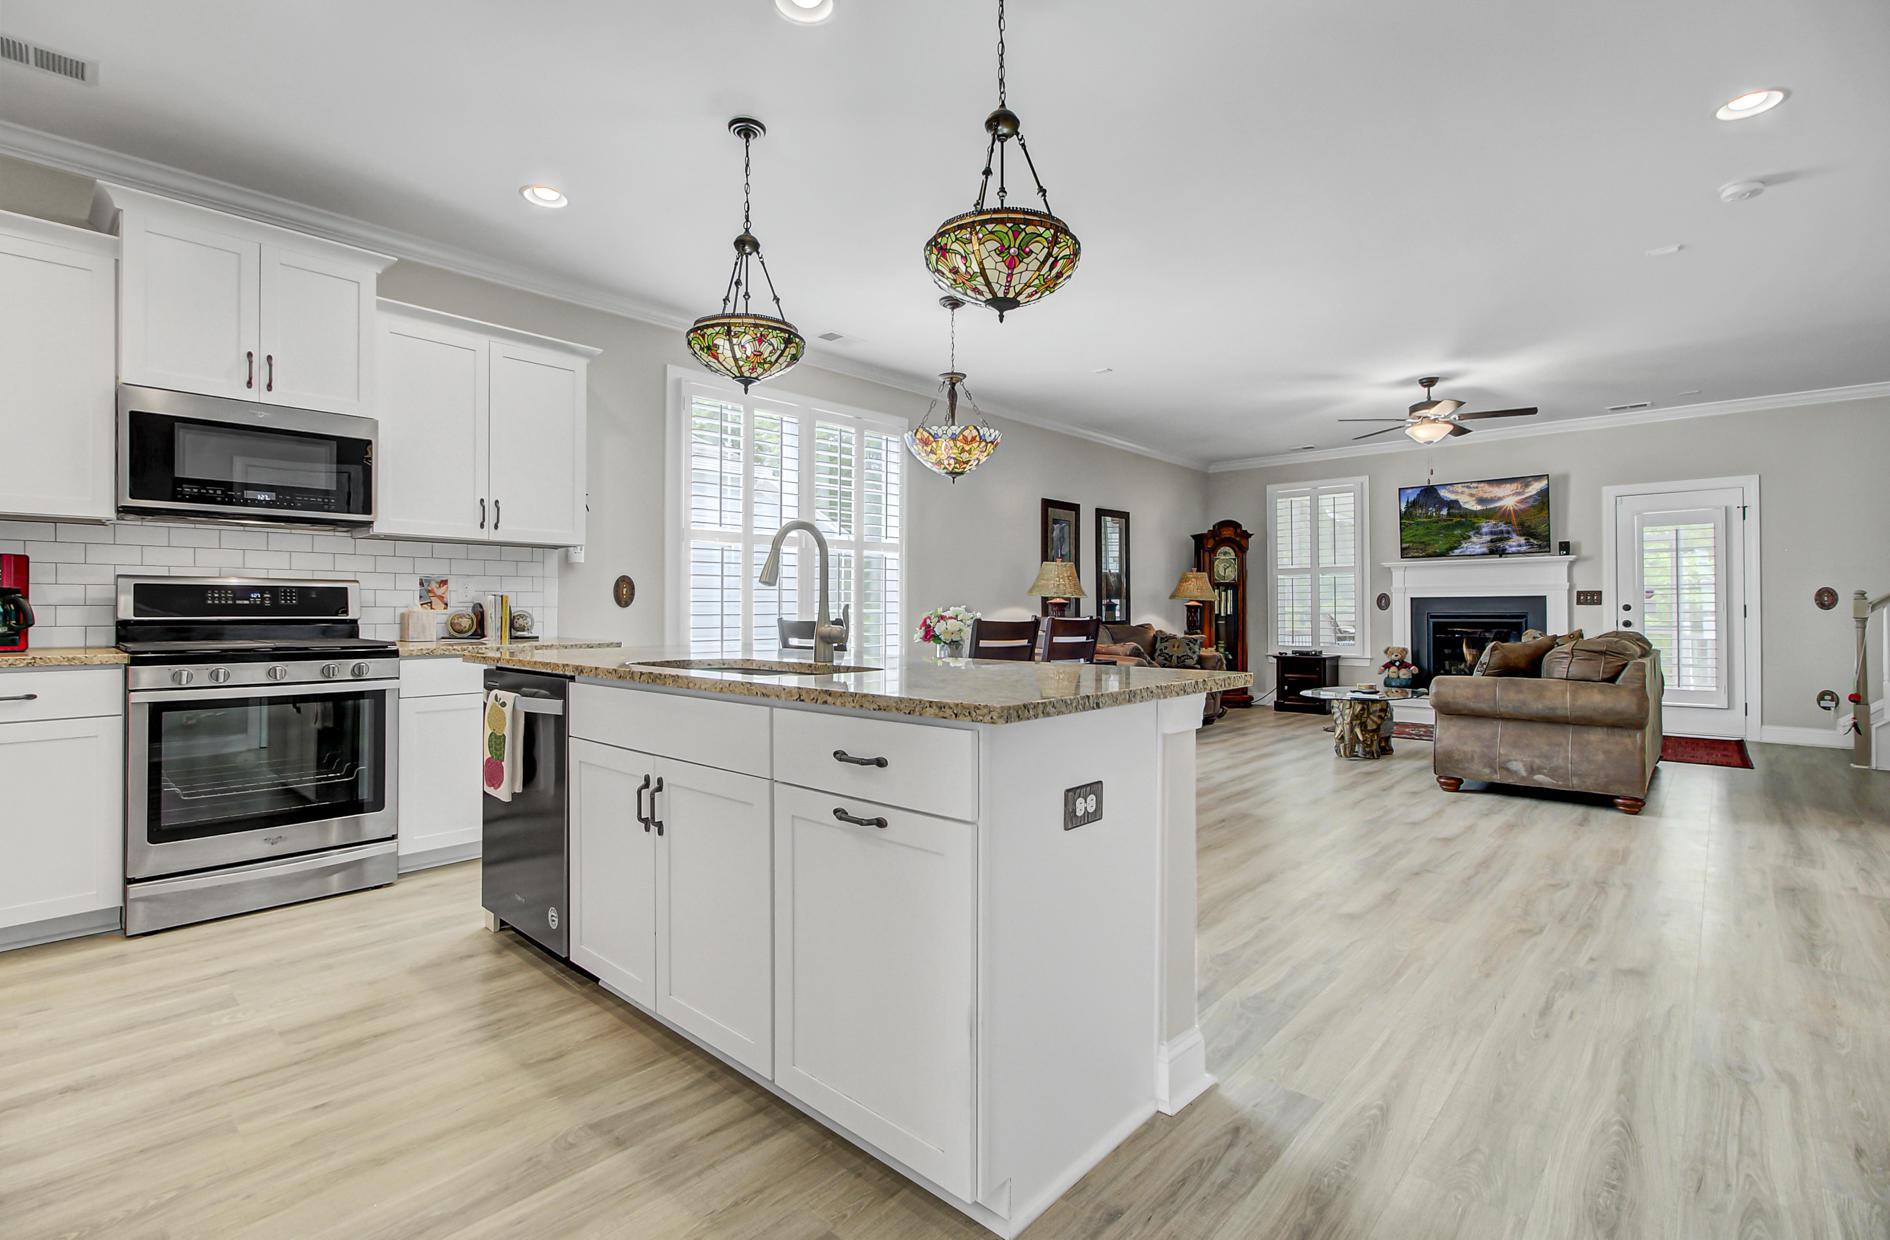 Park West Homes For Sale - 2824 Wagner, Mount Pleasant, SC - 10